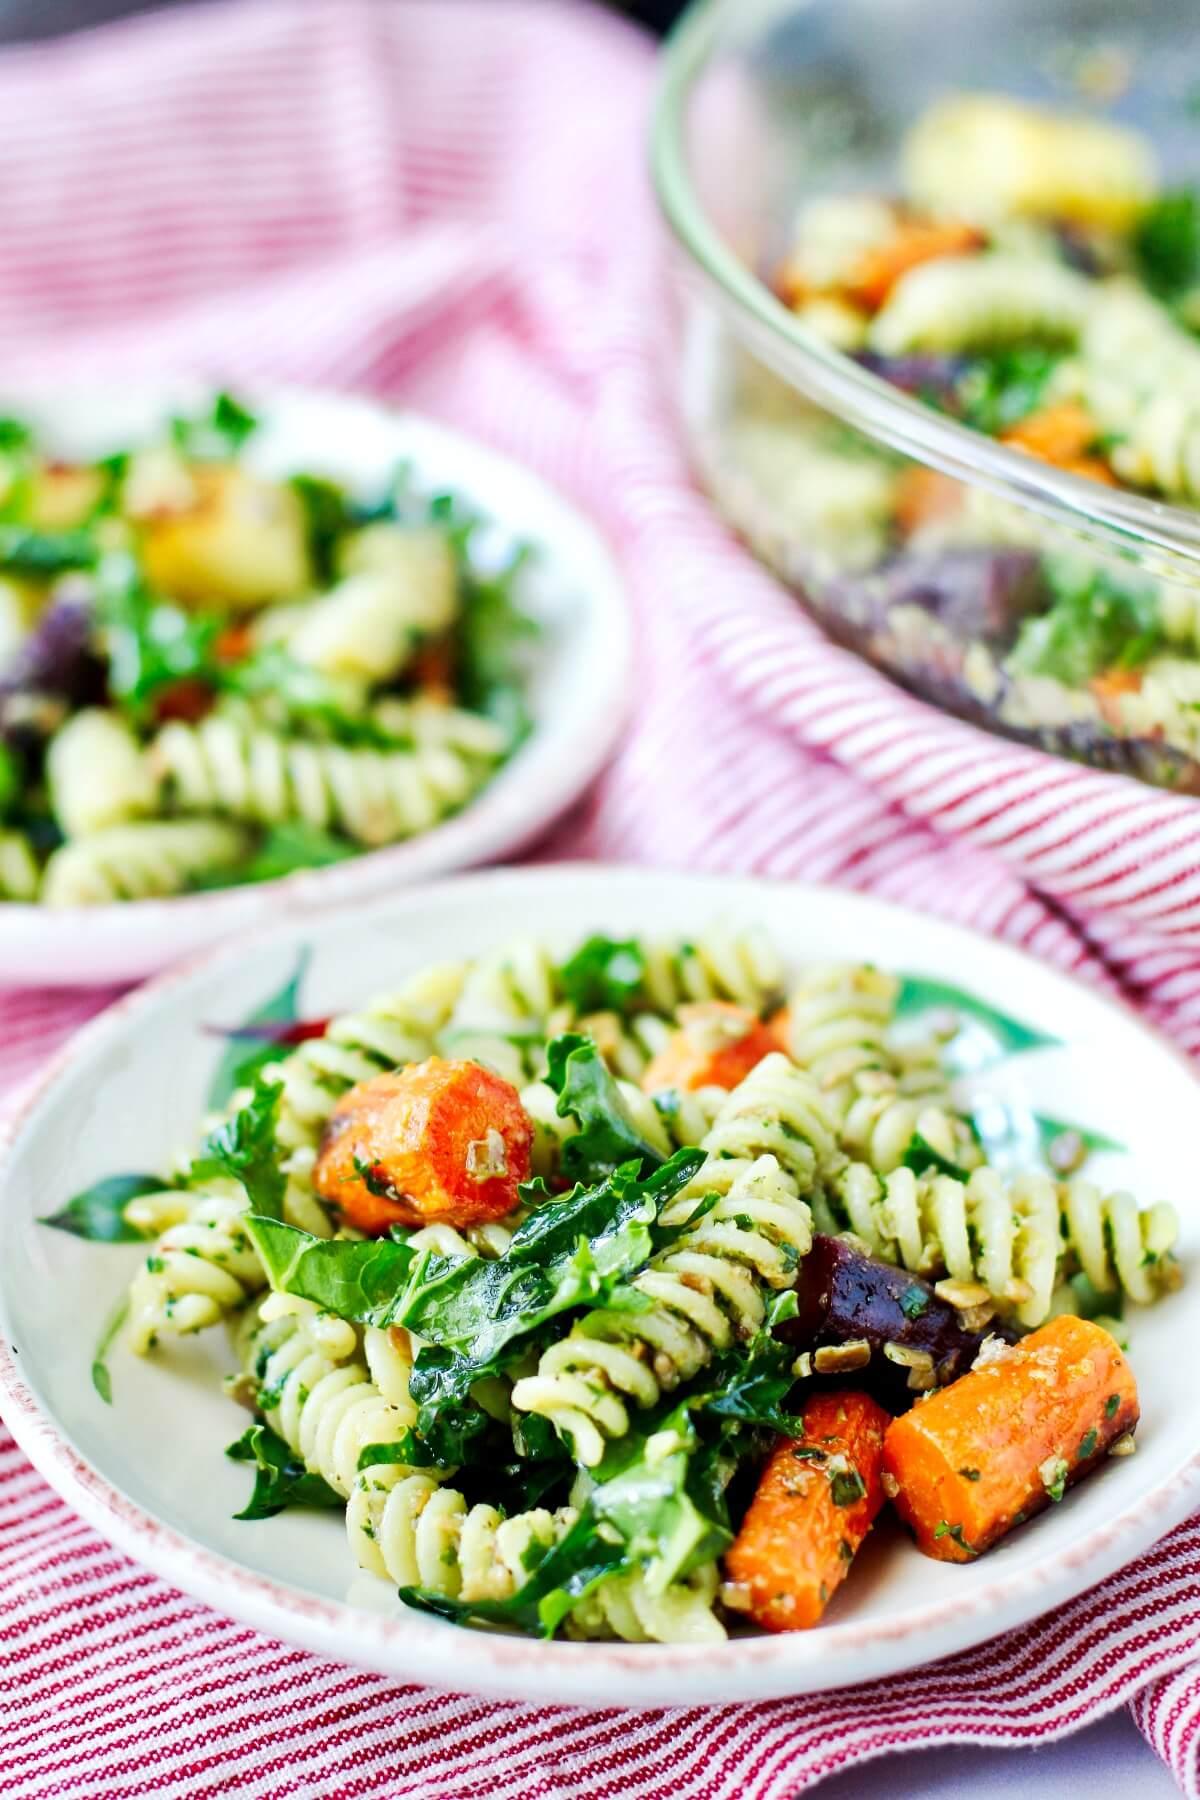 Roasted carrot pasta salad on plates